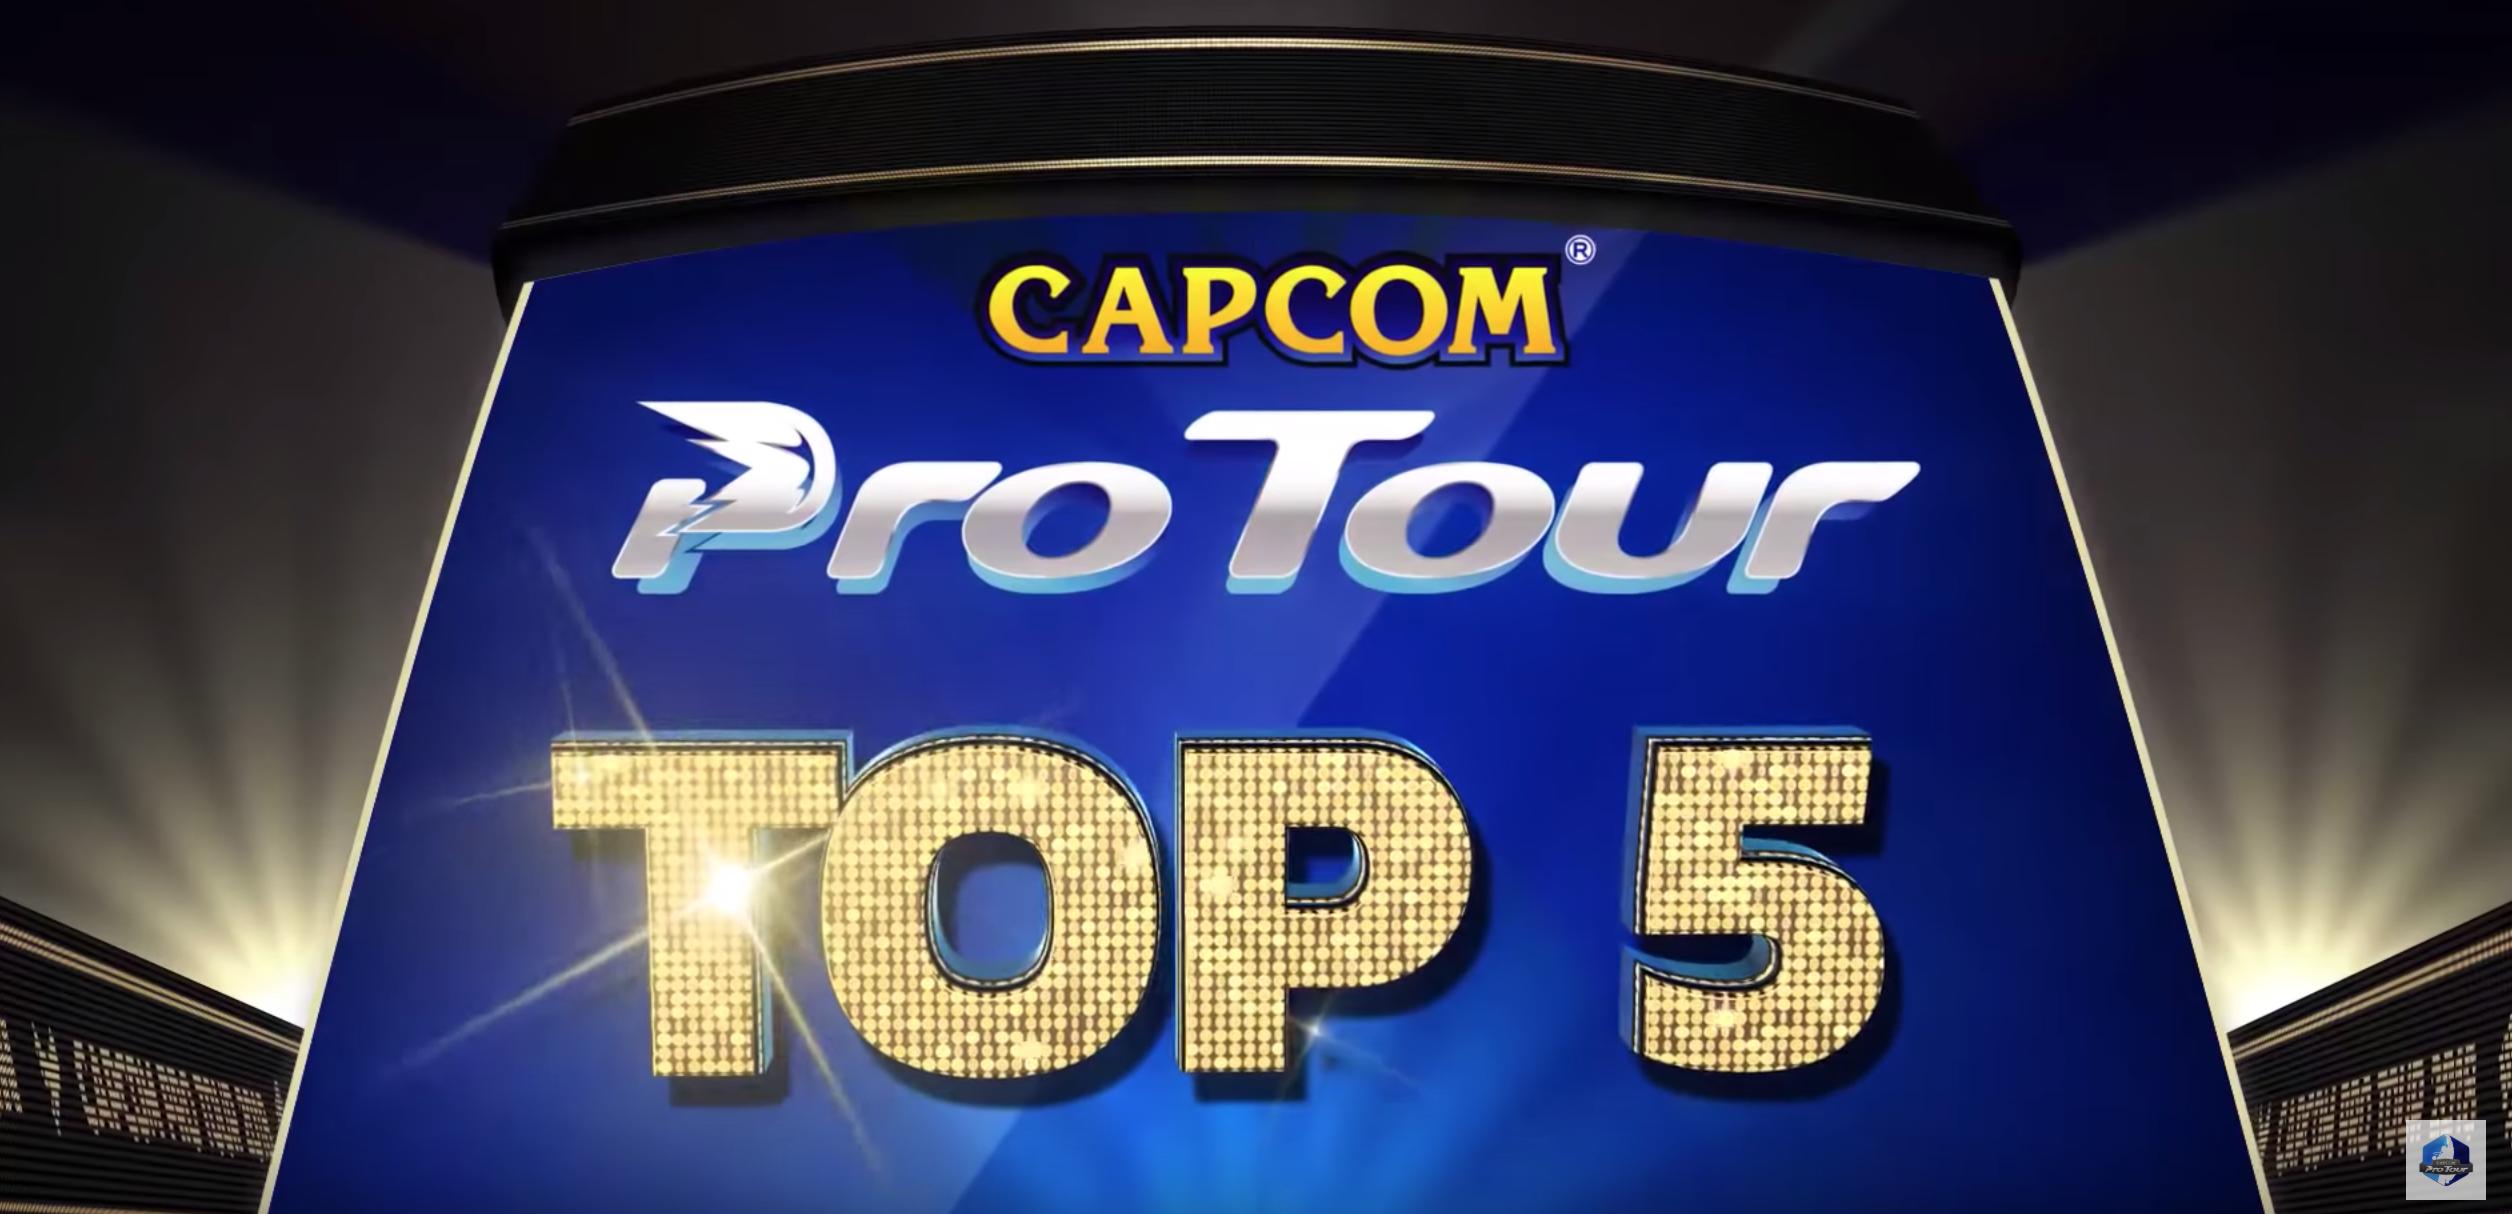 best-of-capcom-cup-2018-capcom-fighters